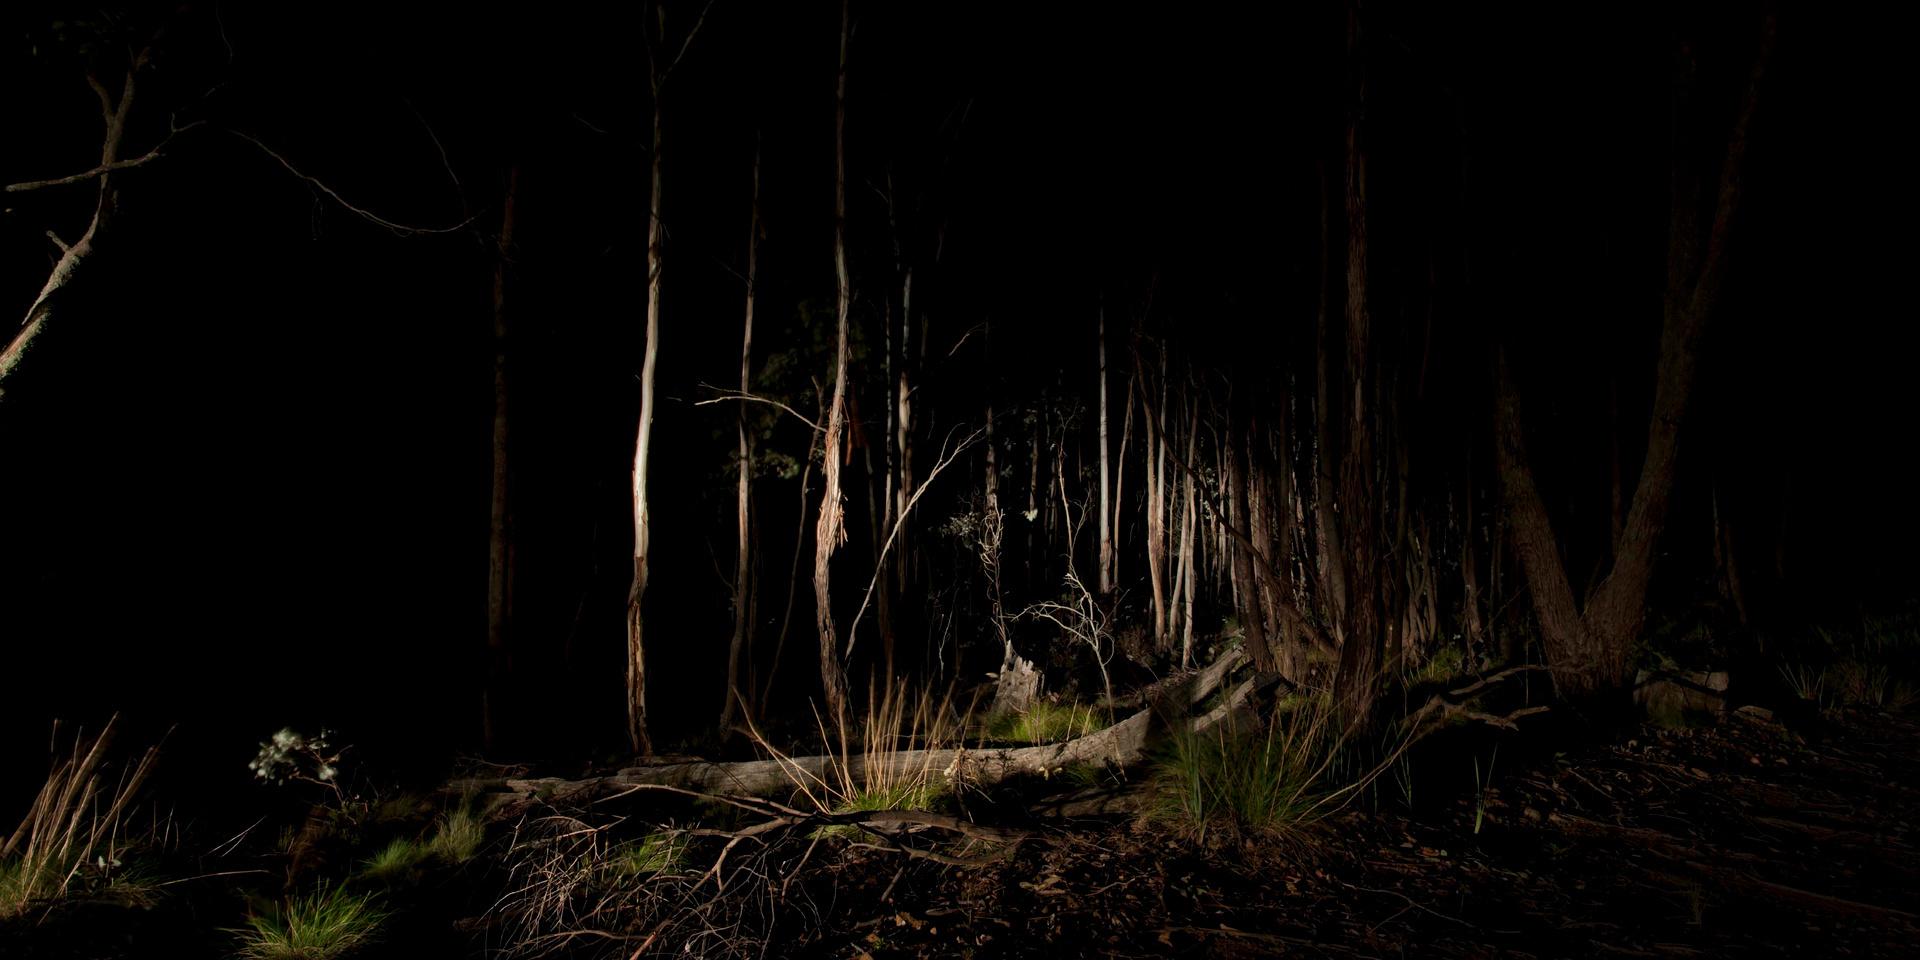 Lightscape #3, 2012